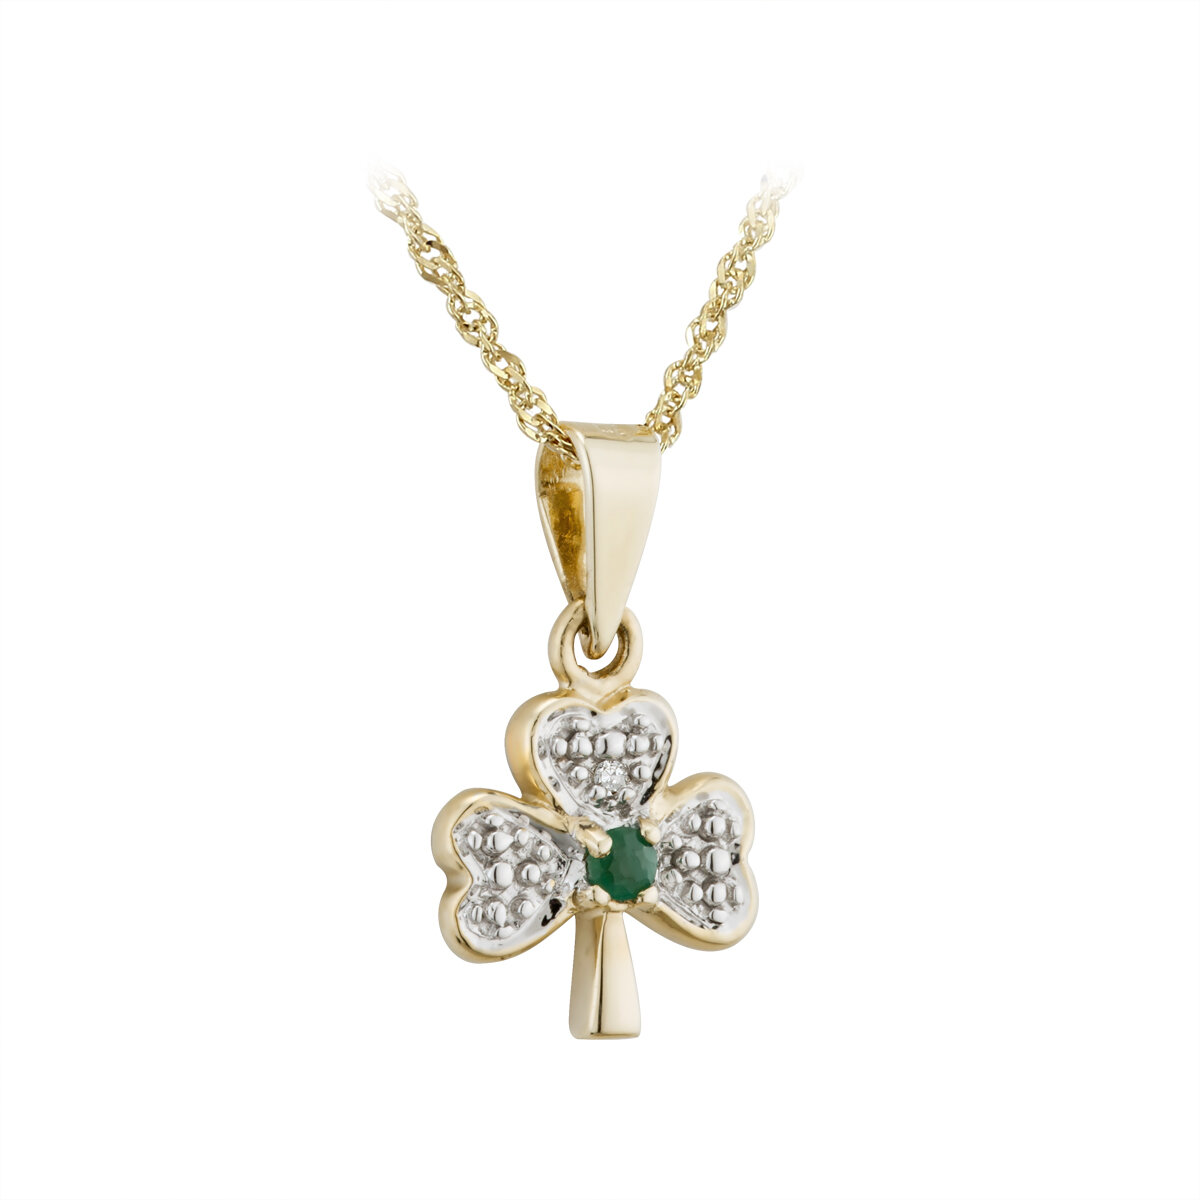 14k gold diamond and emerald shamrock pendant s4512 from Solvar